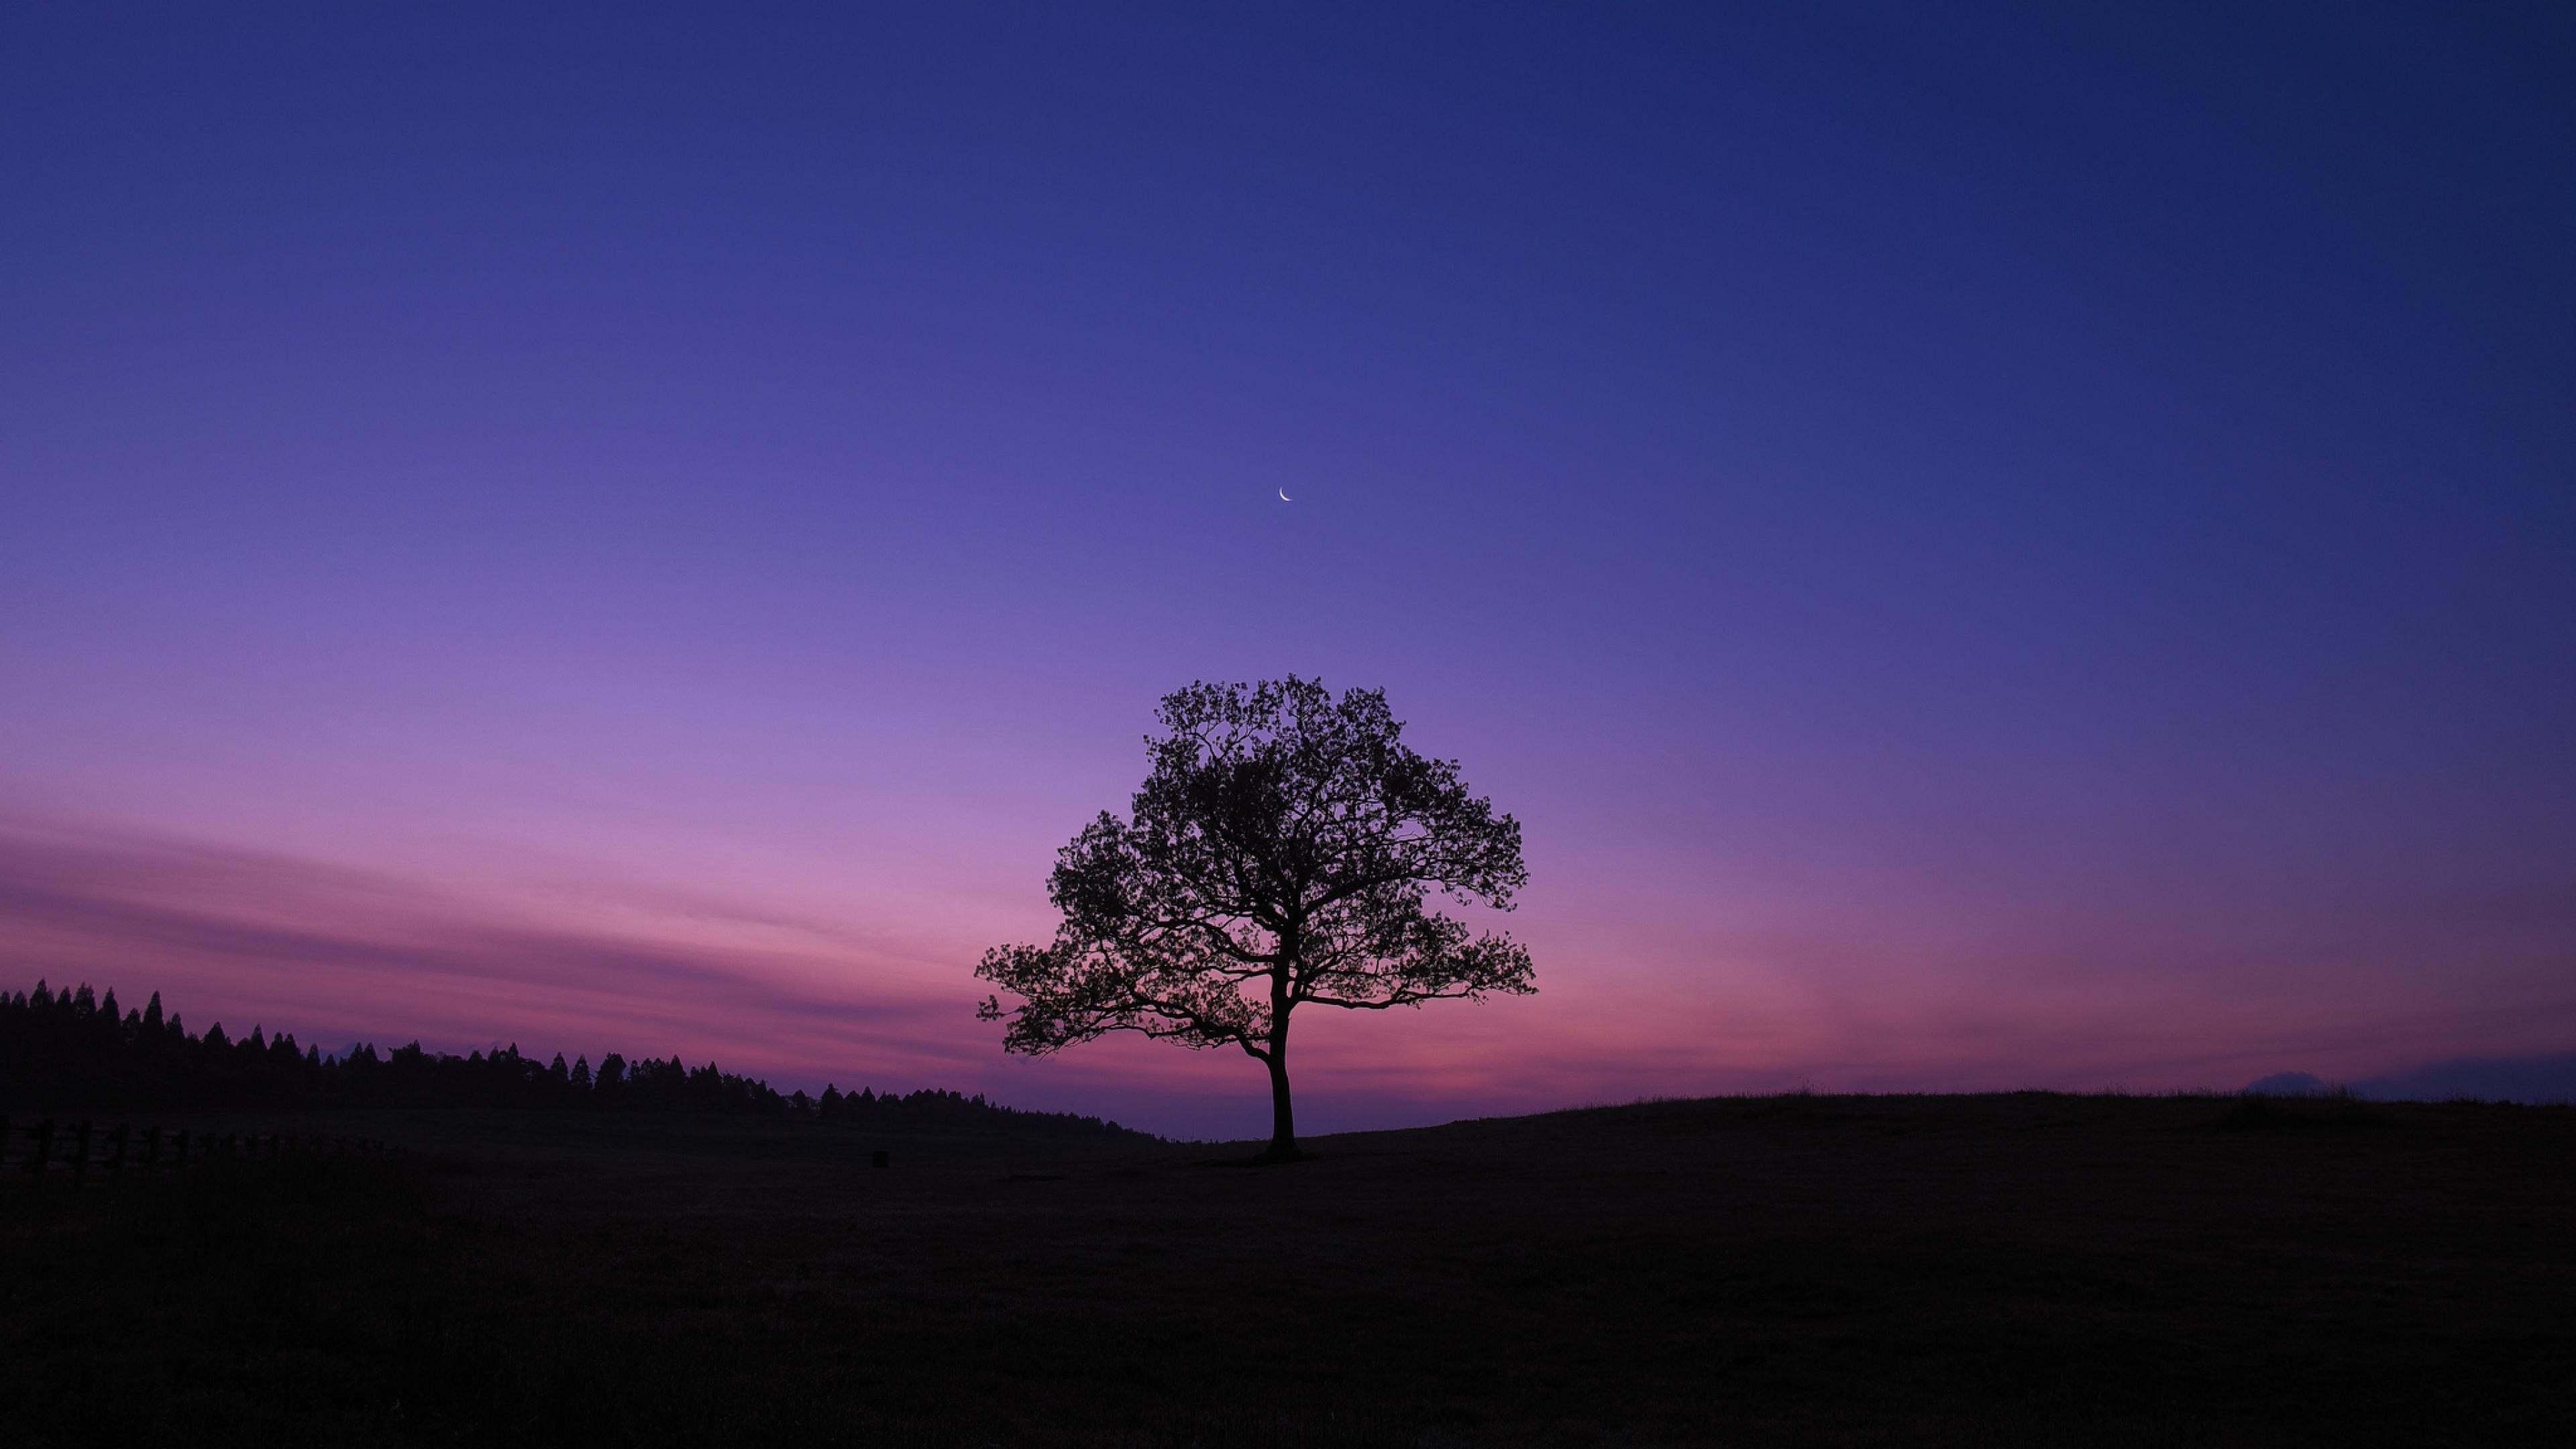 Дерево на фоне космоса